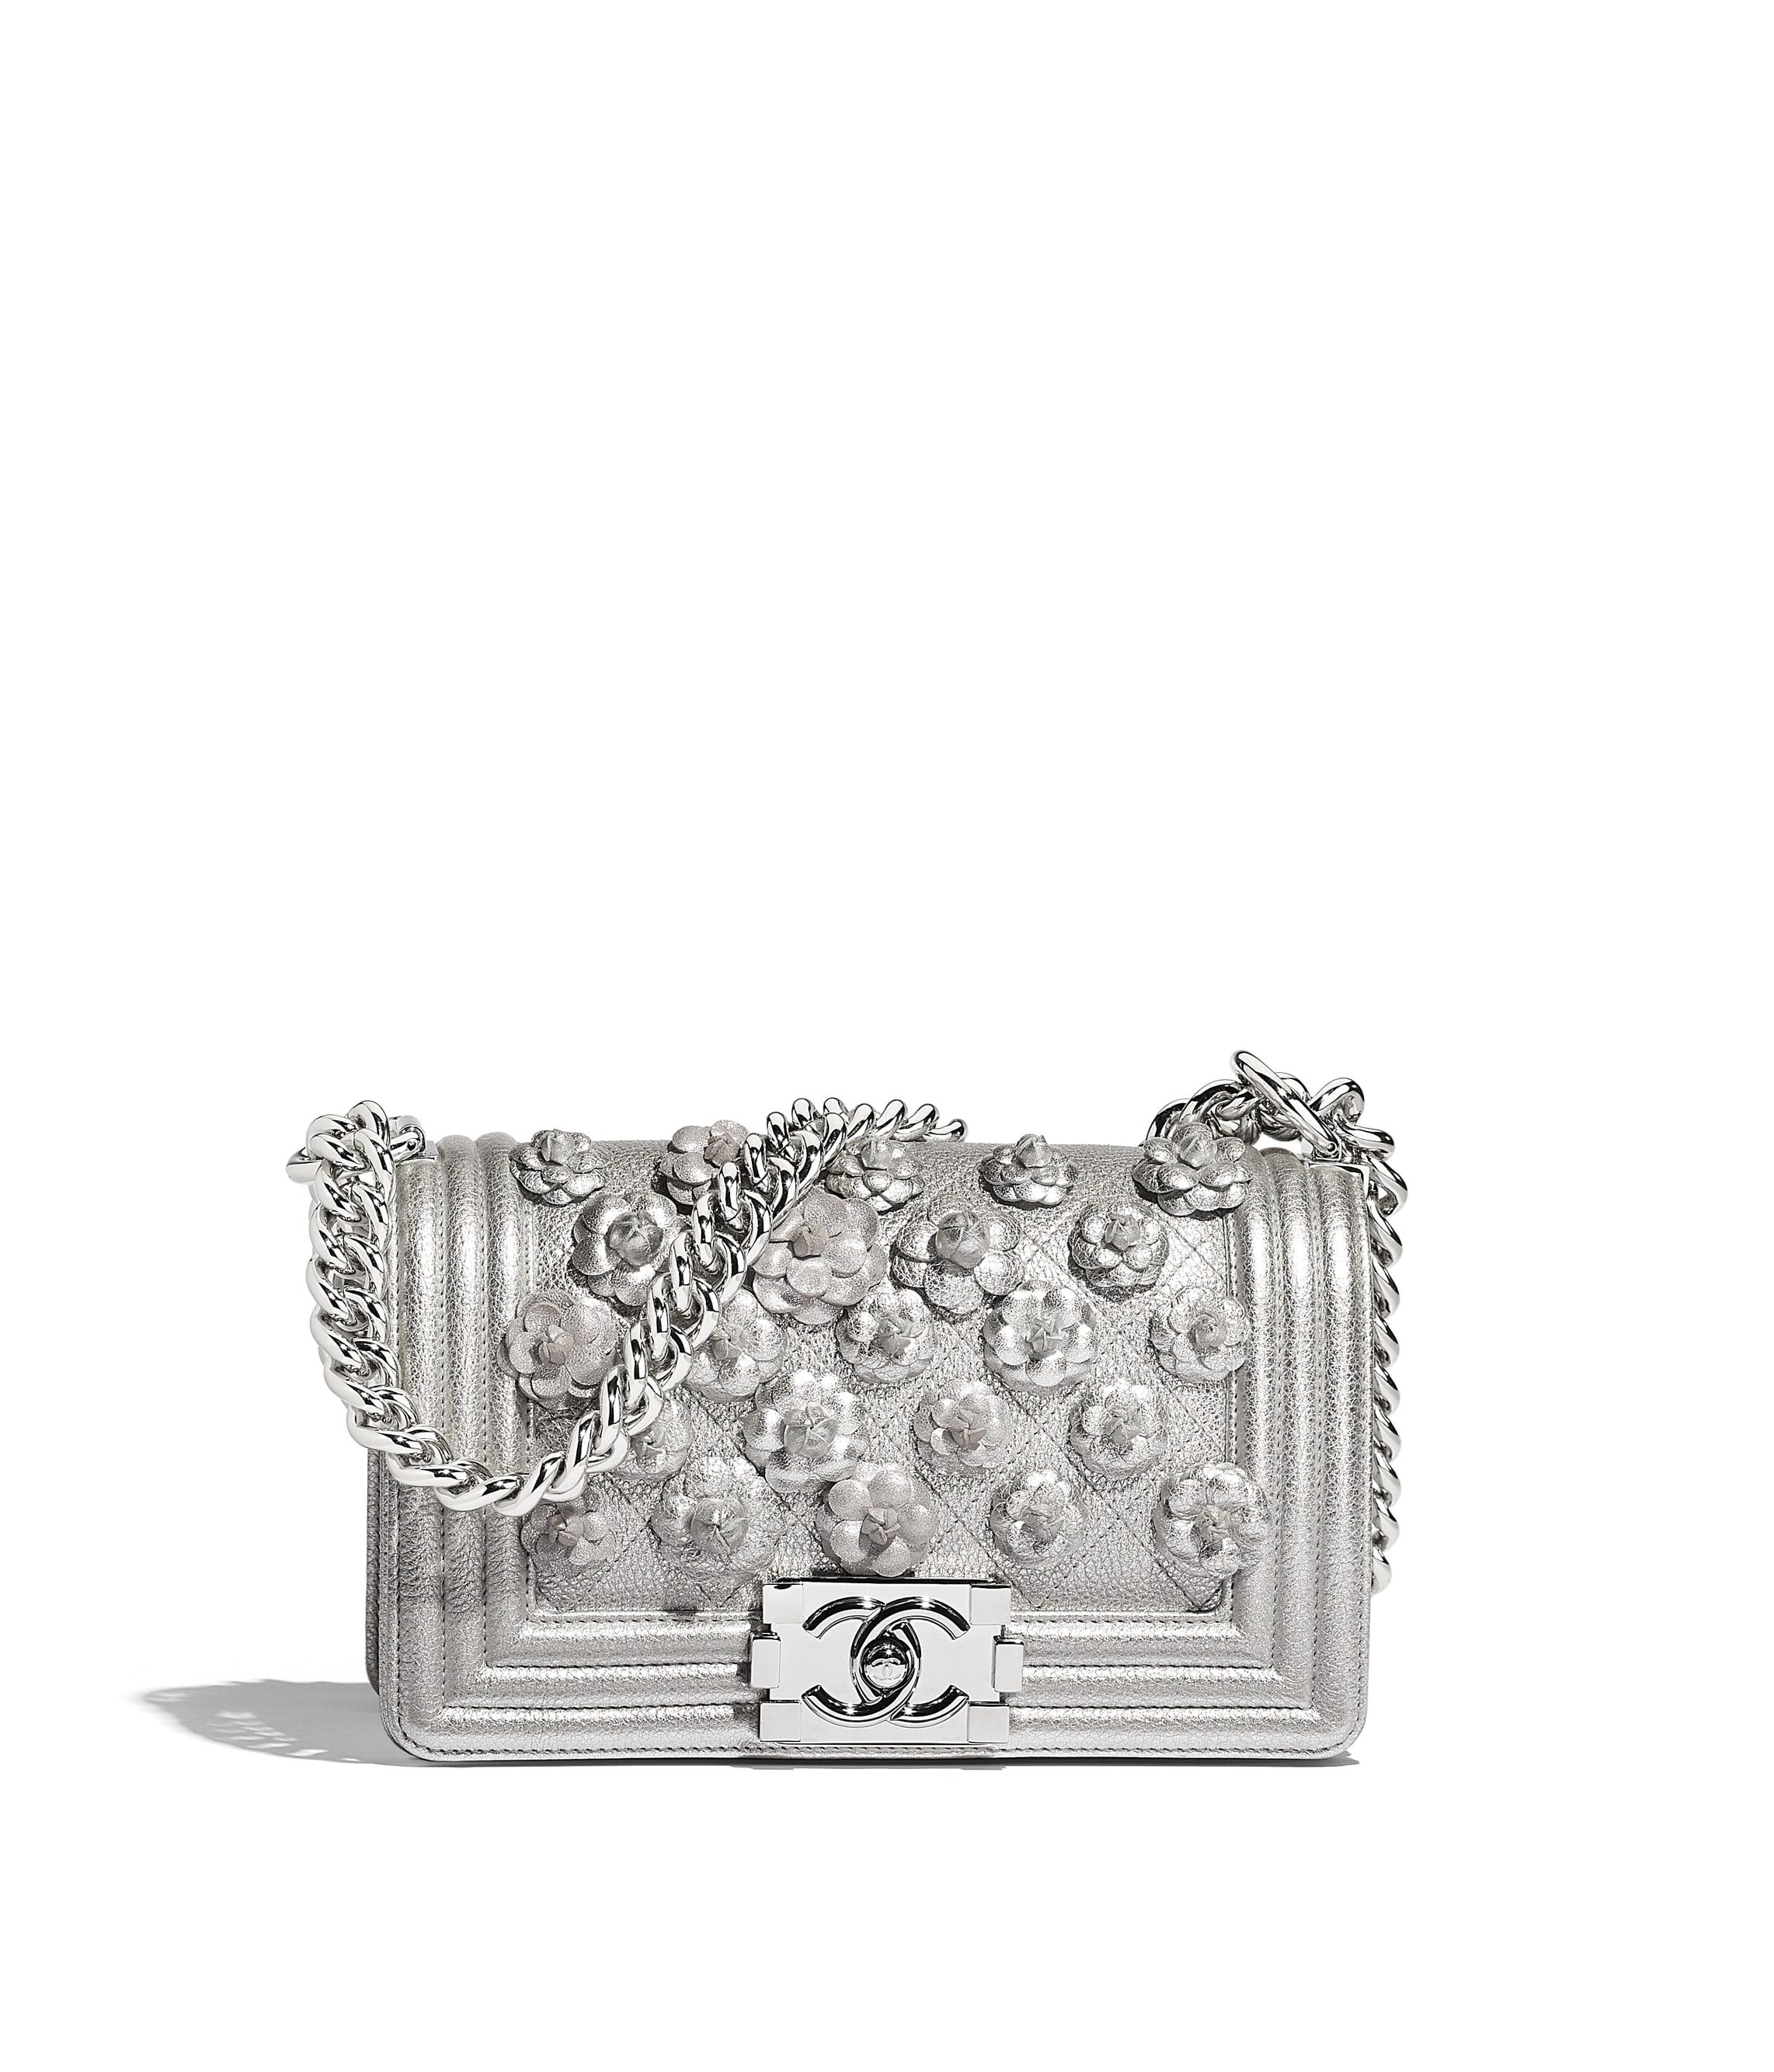 4835ad1f9605aa Small BOY CHANEL Handbag, embroidered metallic grained calfskin ...